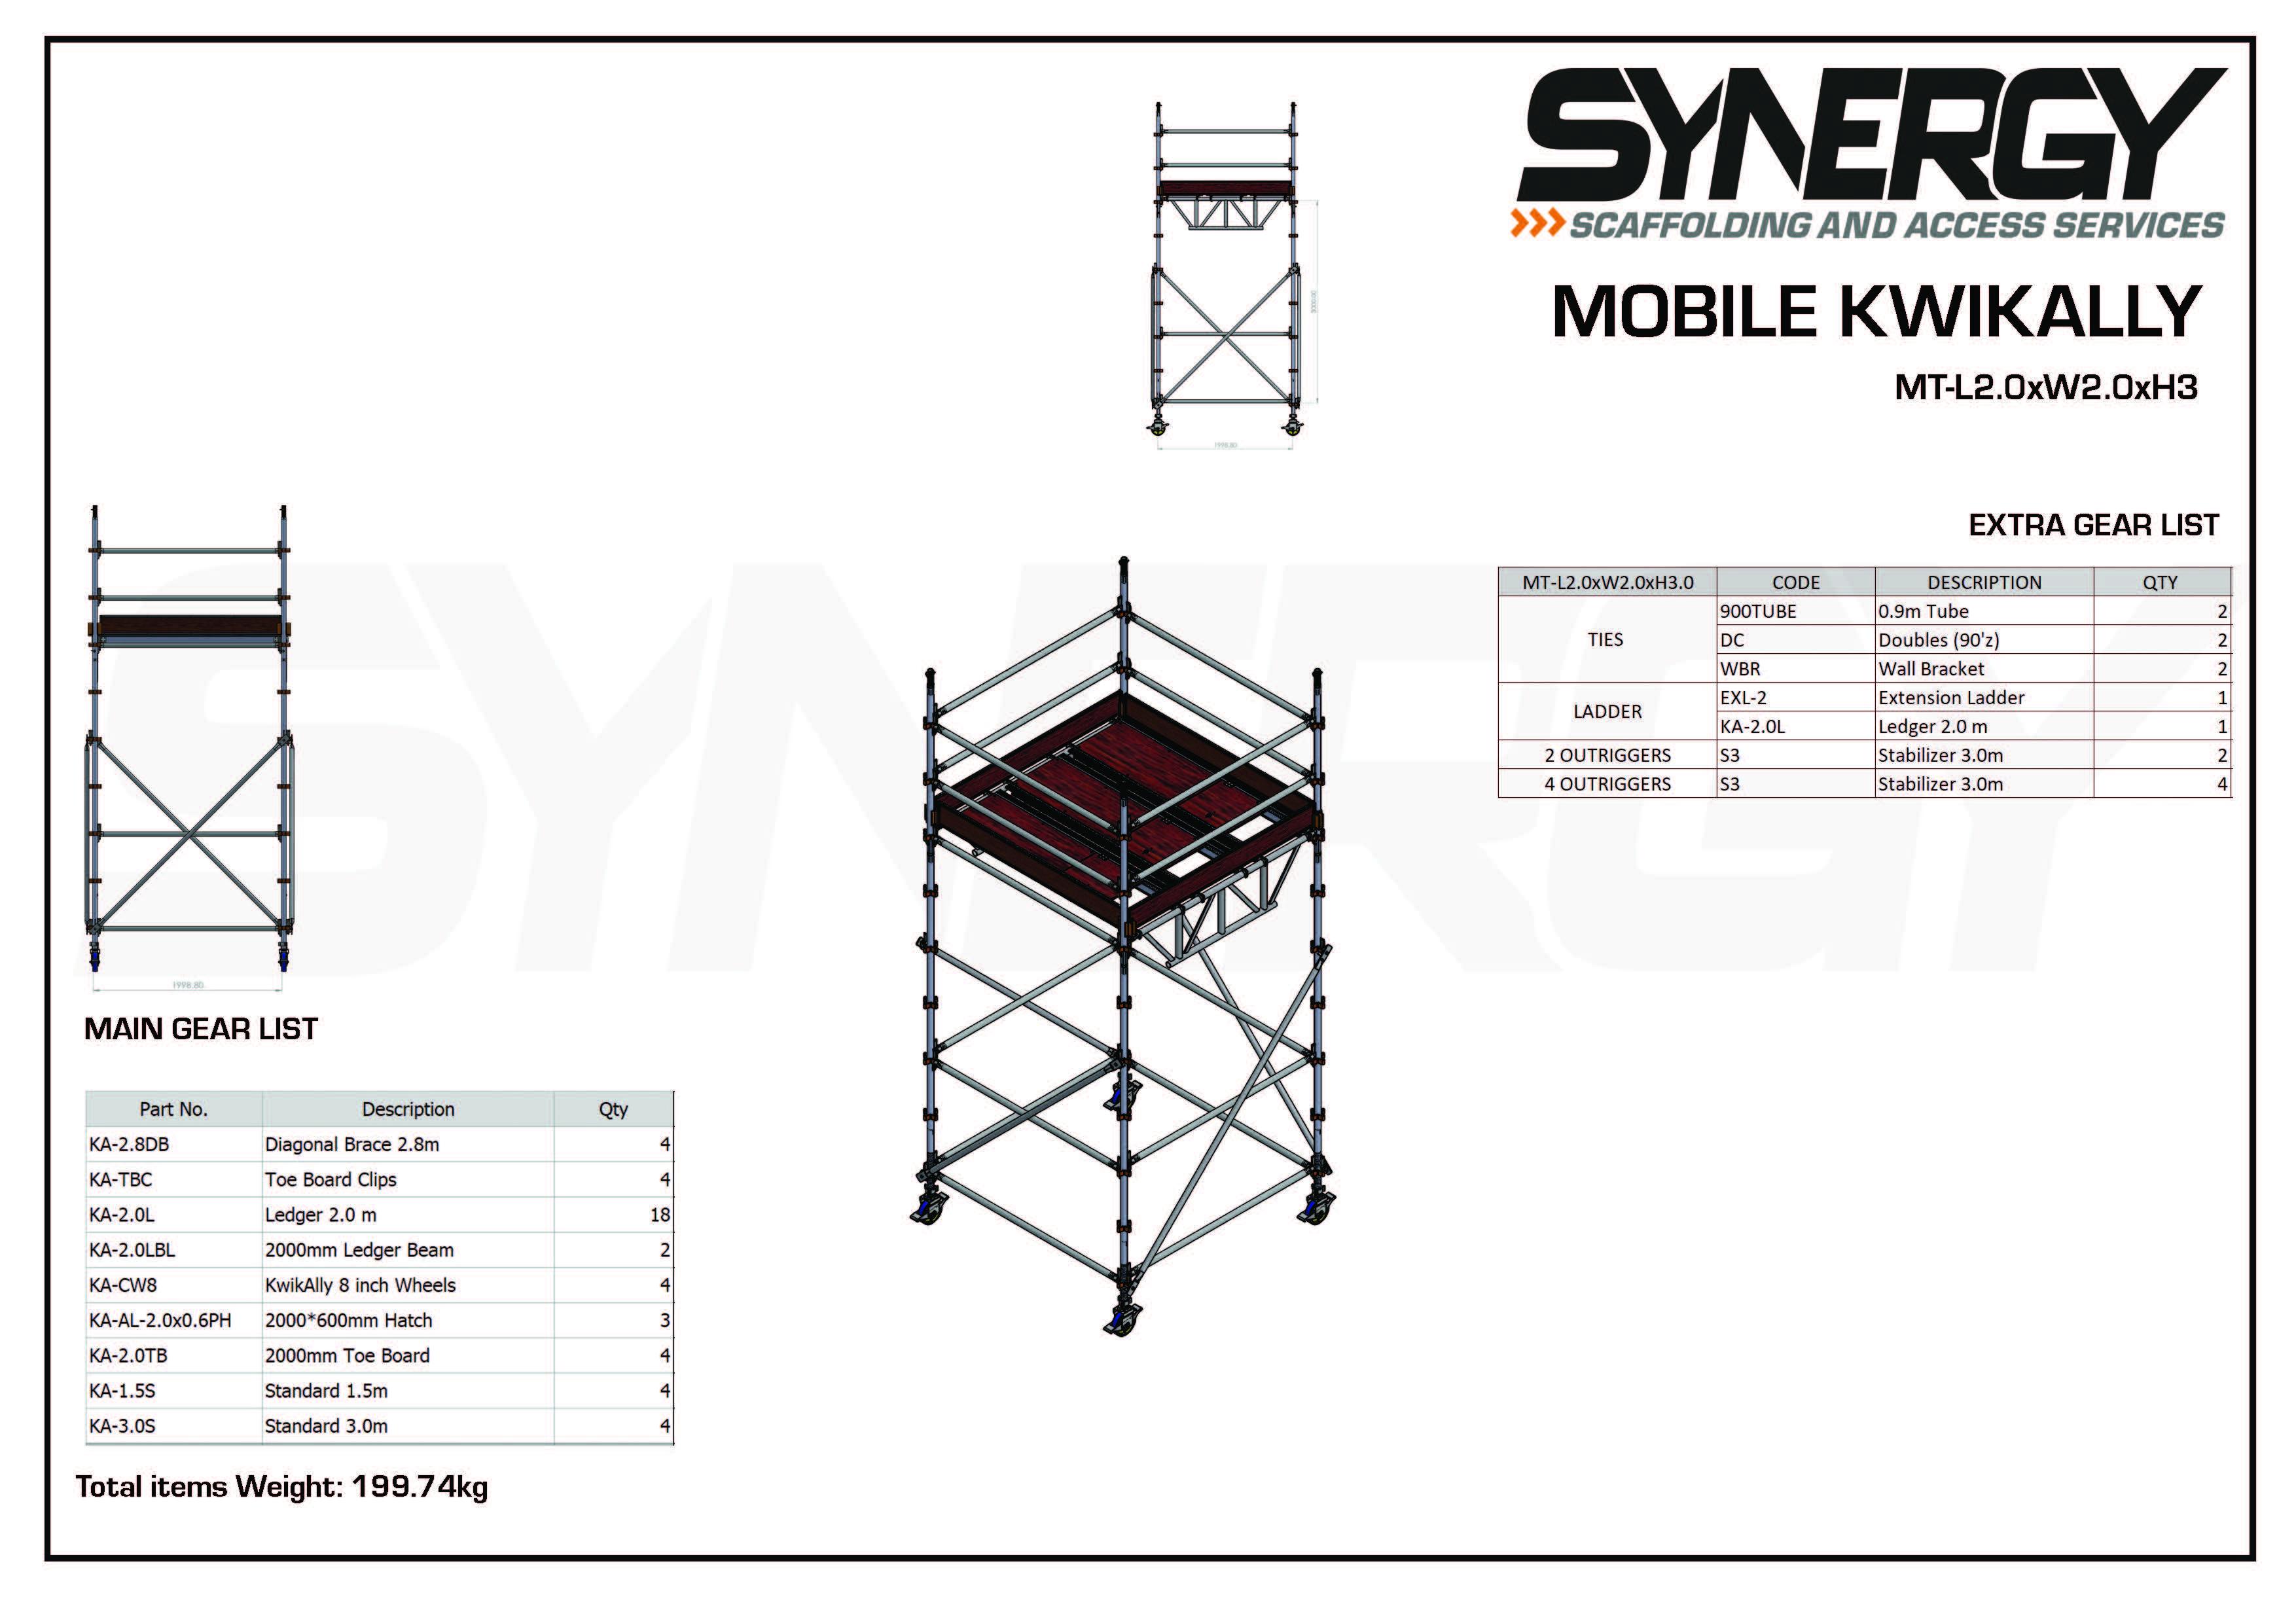 Kwikally Mobile 2.0m x 2.0m x 3m(Height)